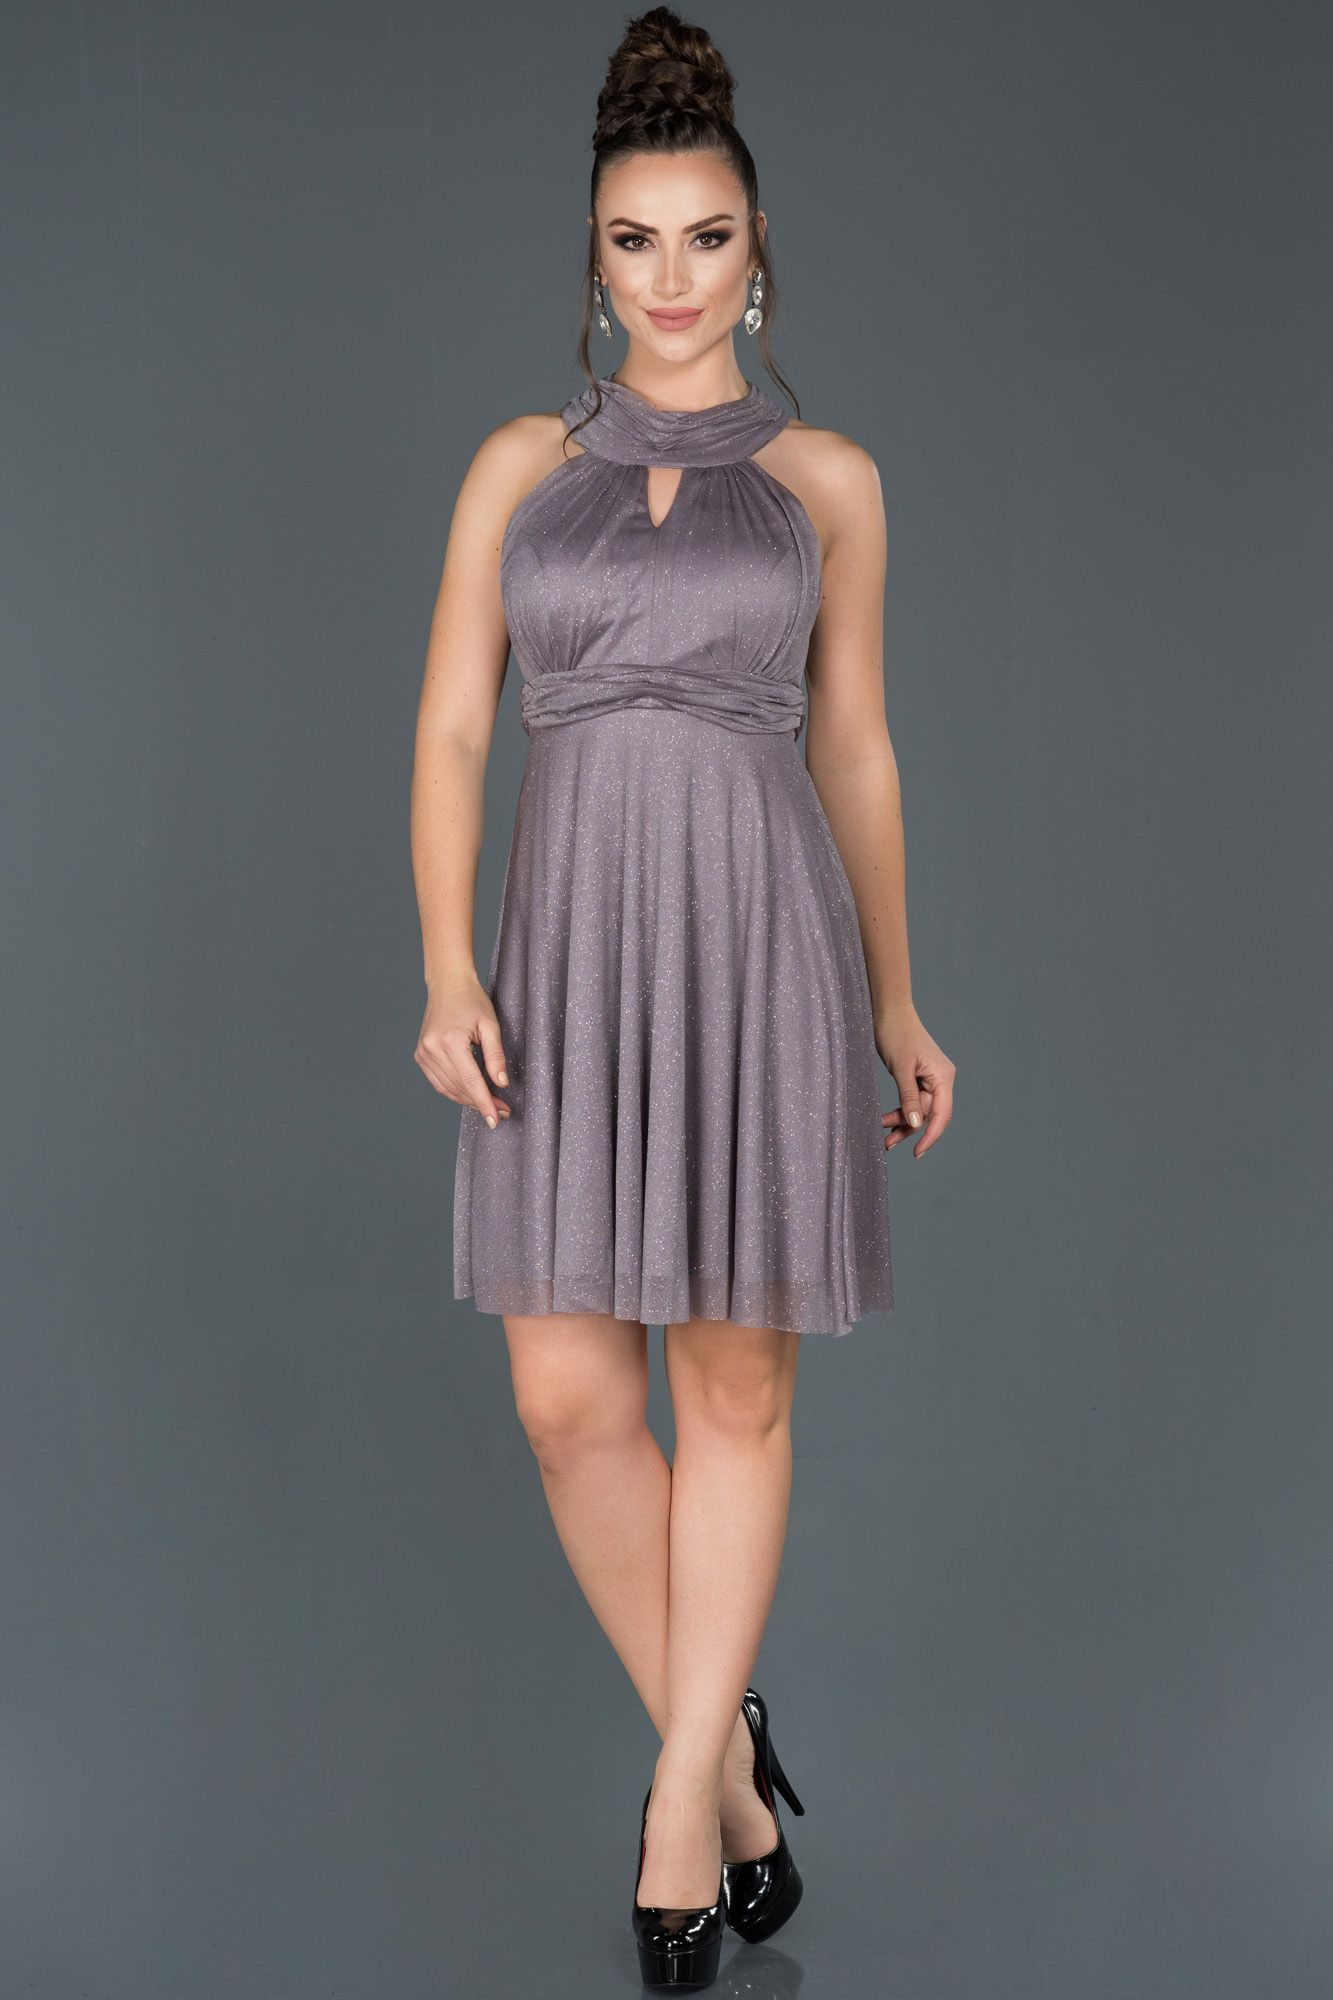 Koyu Mor Kisa Sirt Dekolteli Abiye Elbise Abk527 2020 Elbise The Dress Elbise Modelleri